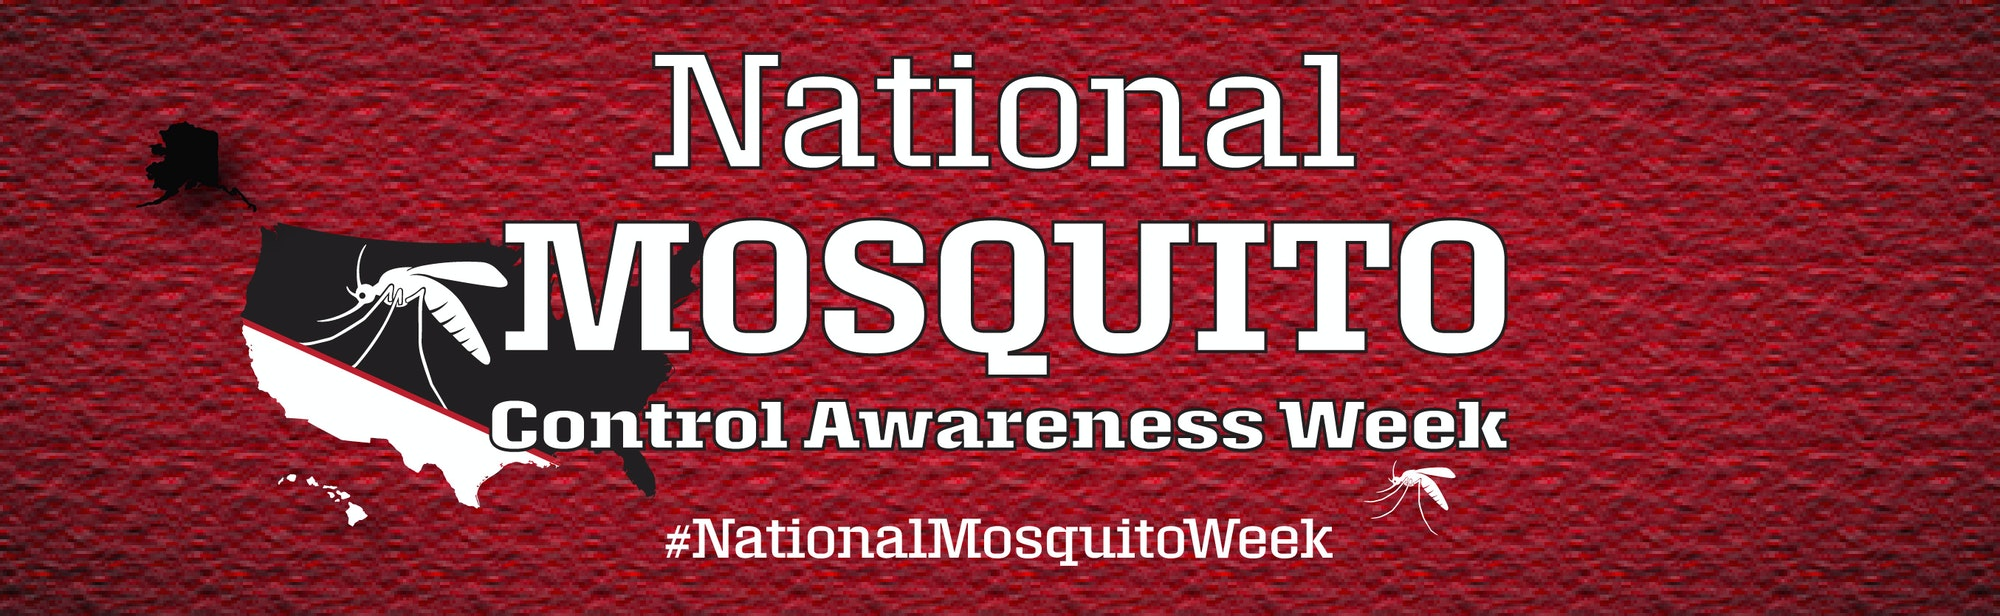 National Mosquito Control Awareness Week